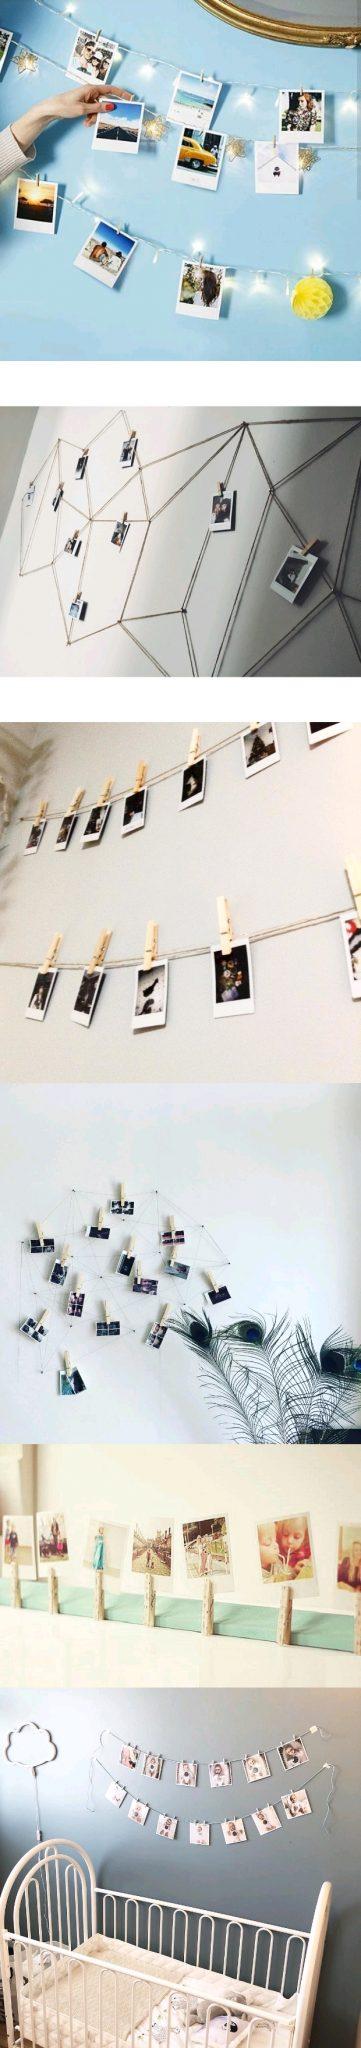 polaroid display clothespin